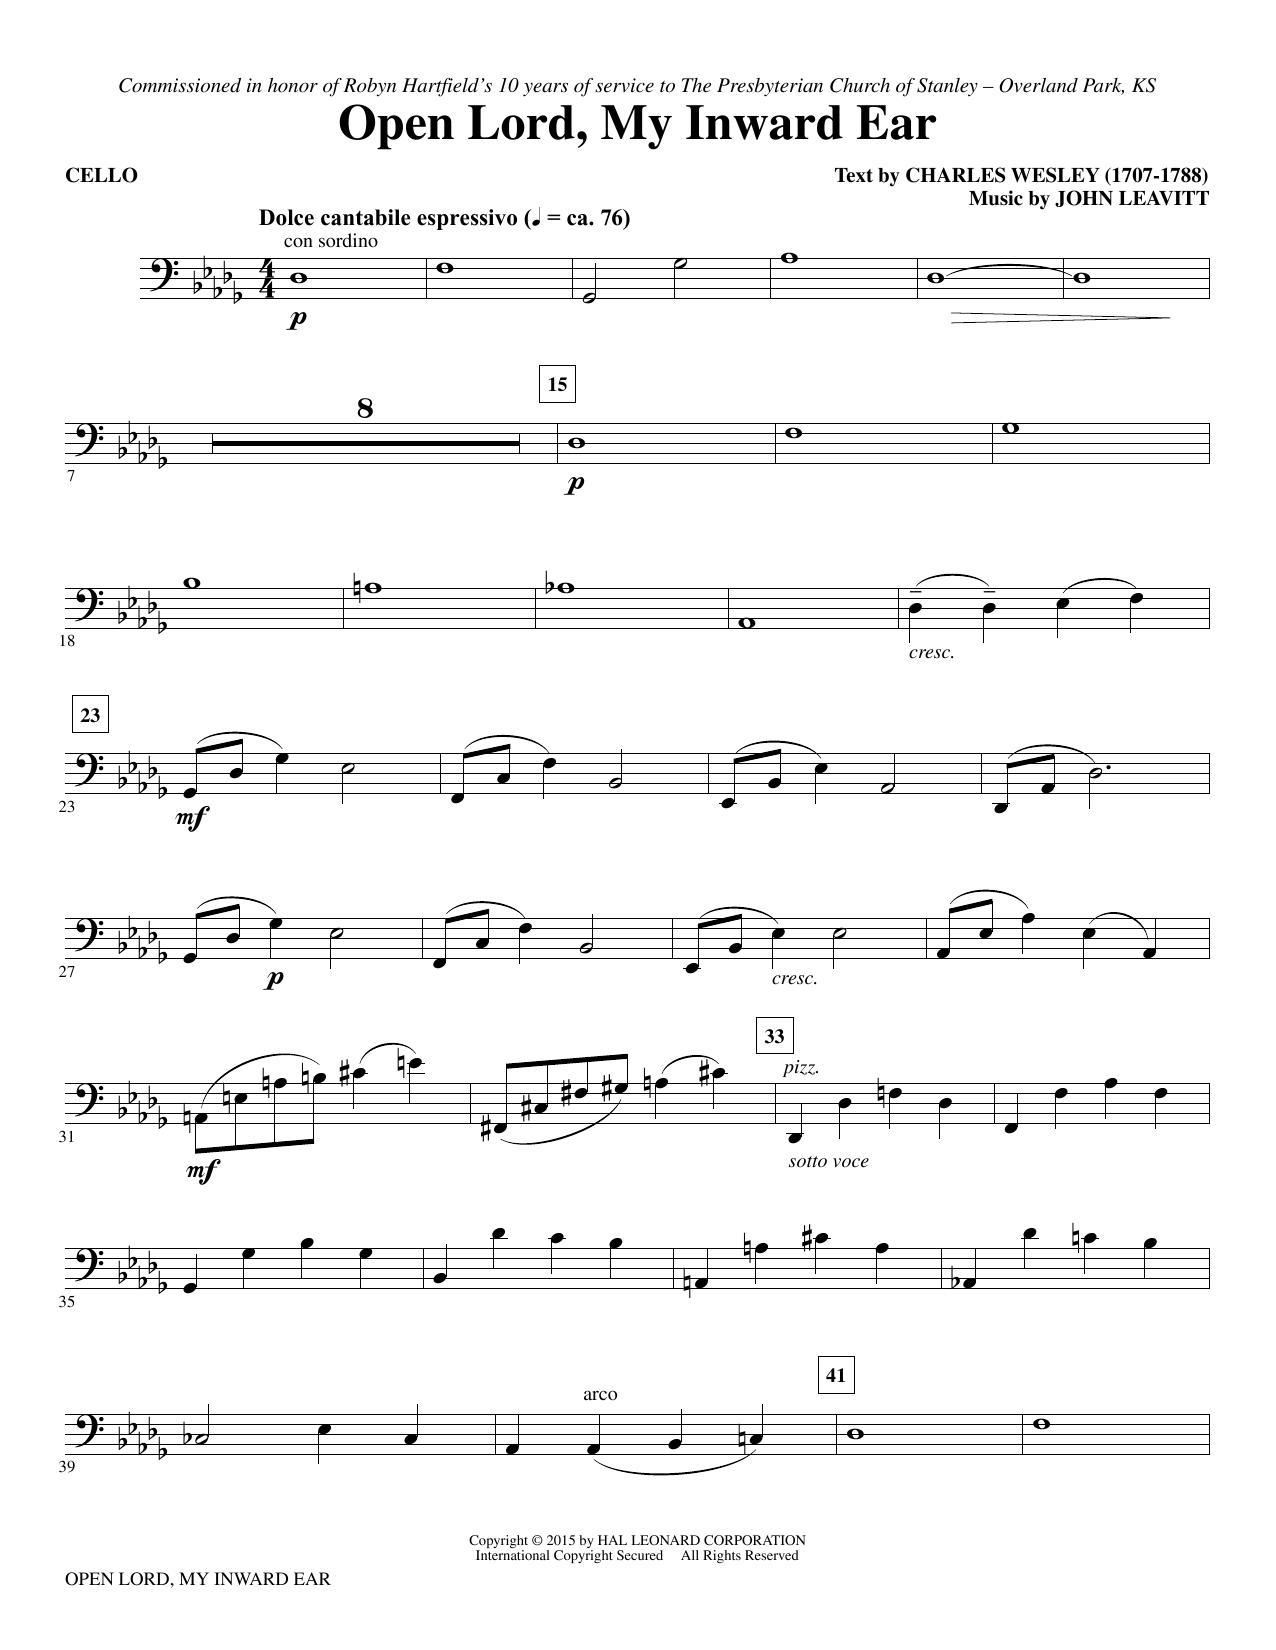 Open Lord, My Inward Ear - Cello sheet music